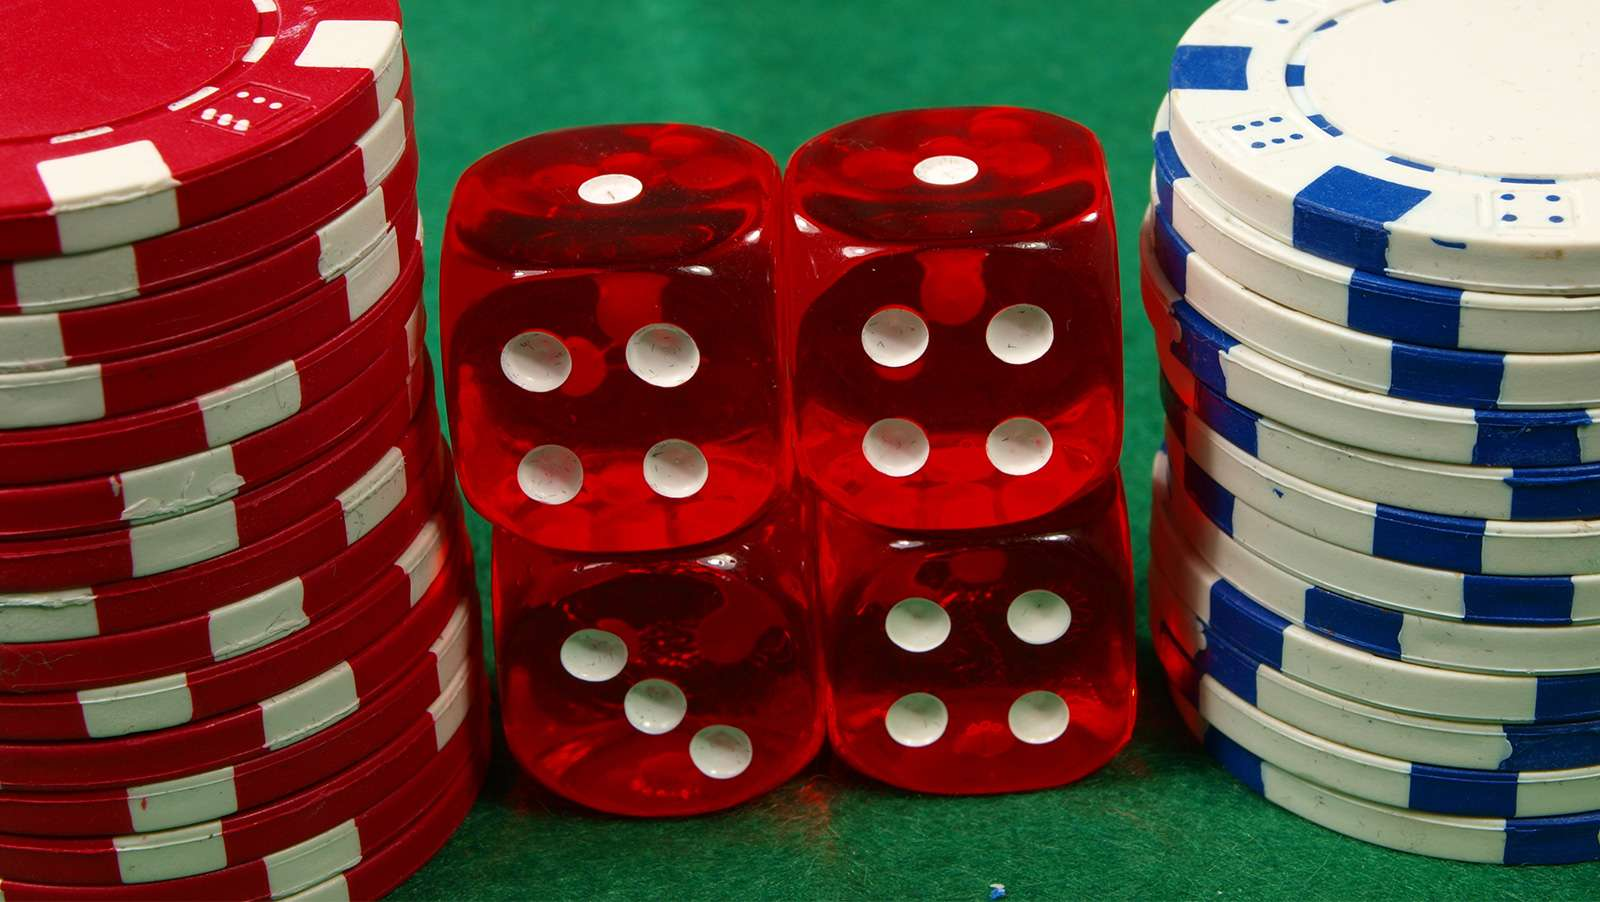 marc-goschel-wins-wptdeepstacks-germany-sasa-lalos-wins-the-high-roller